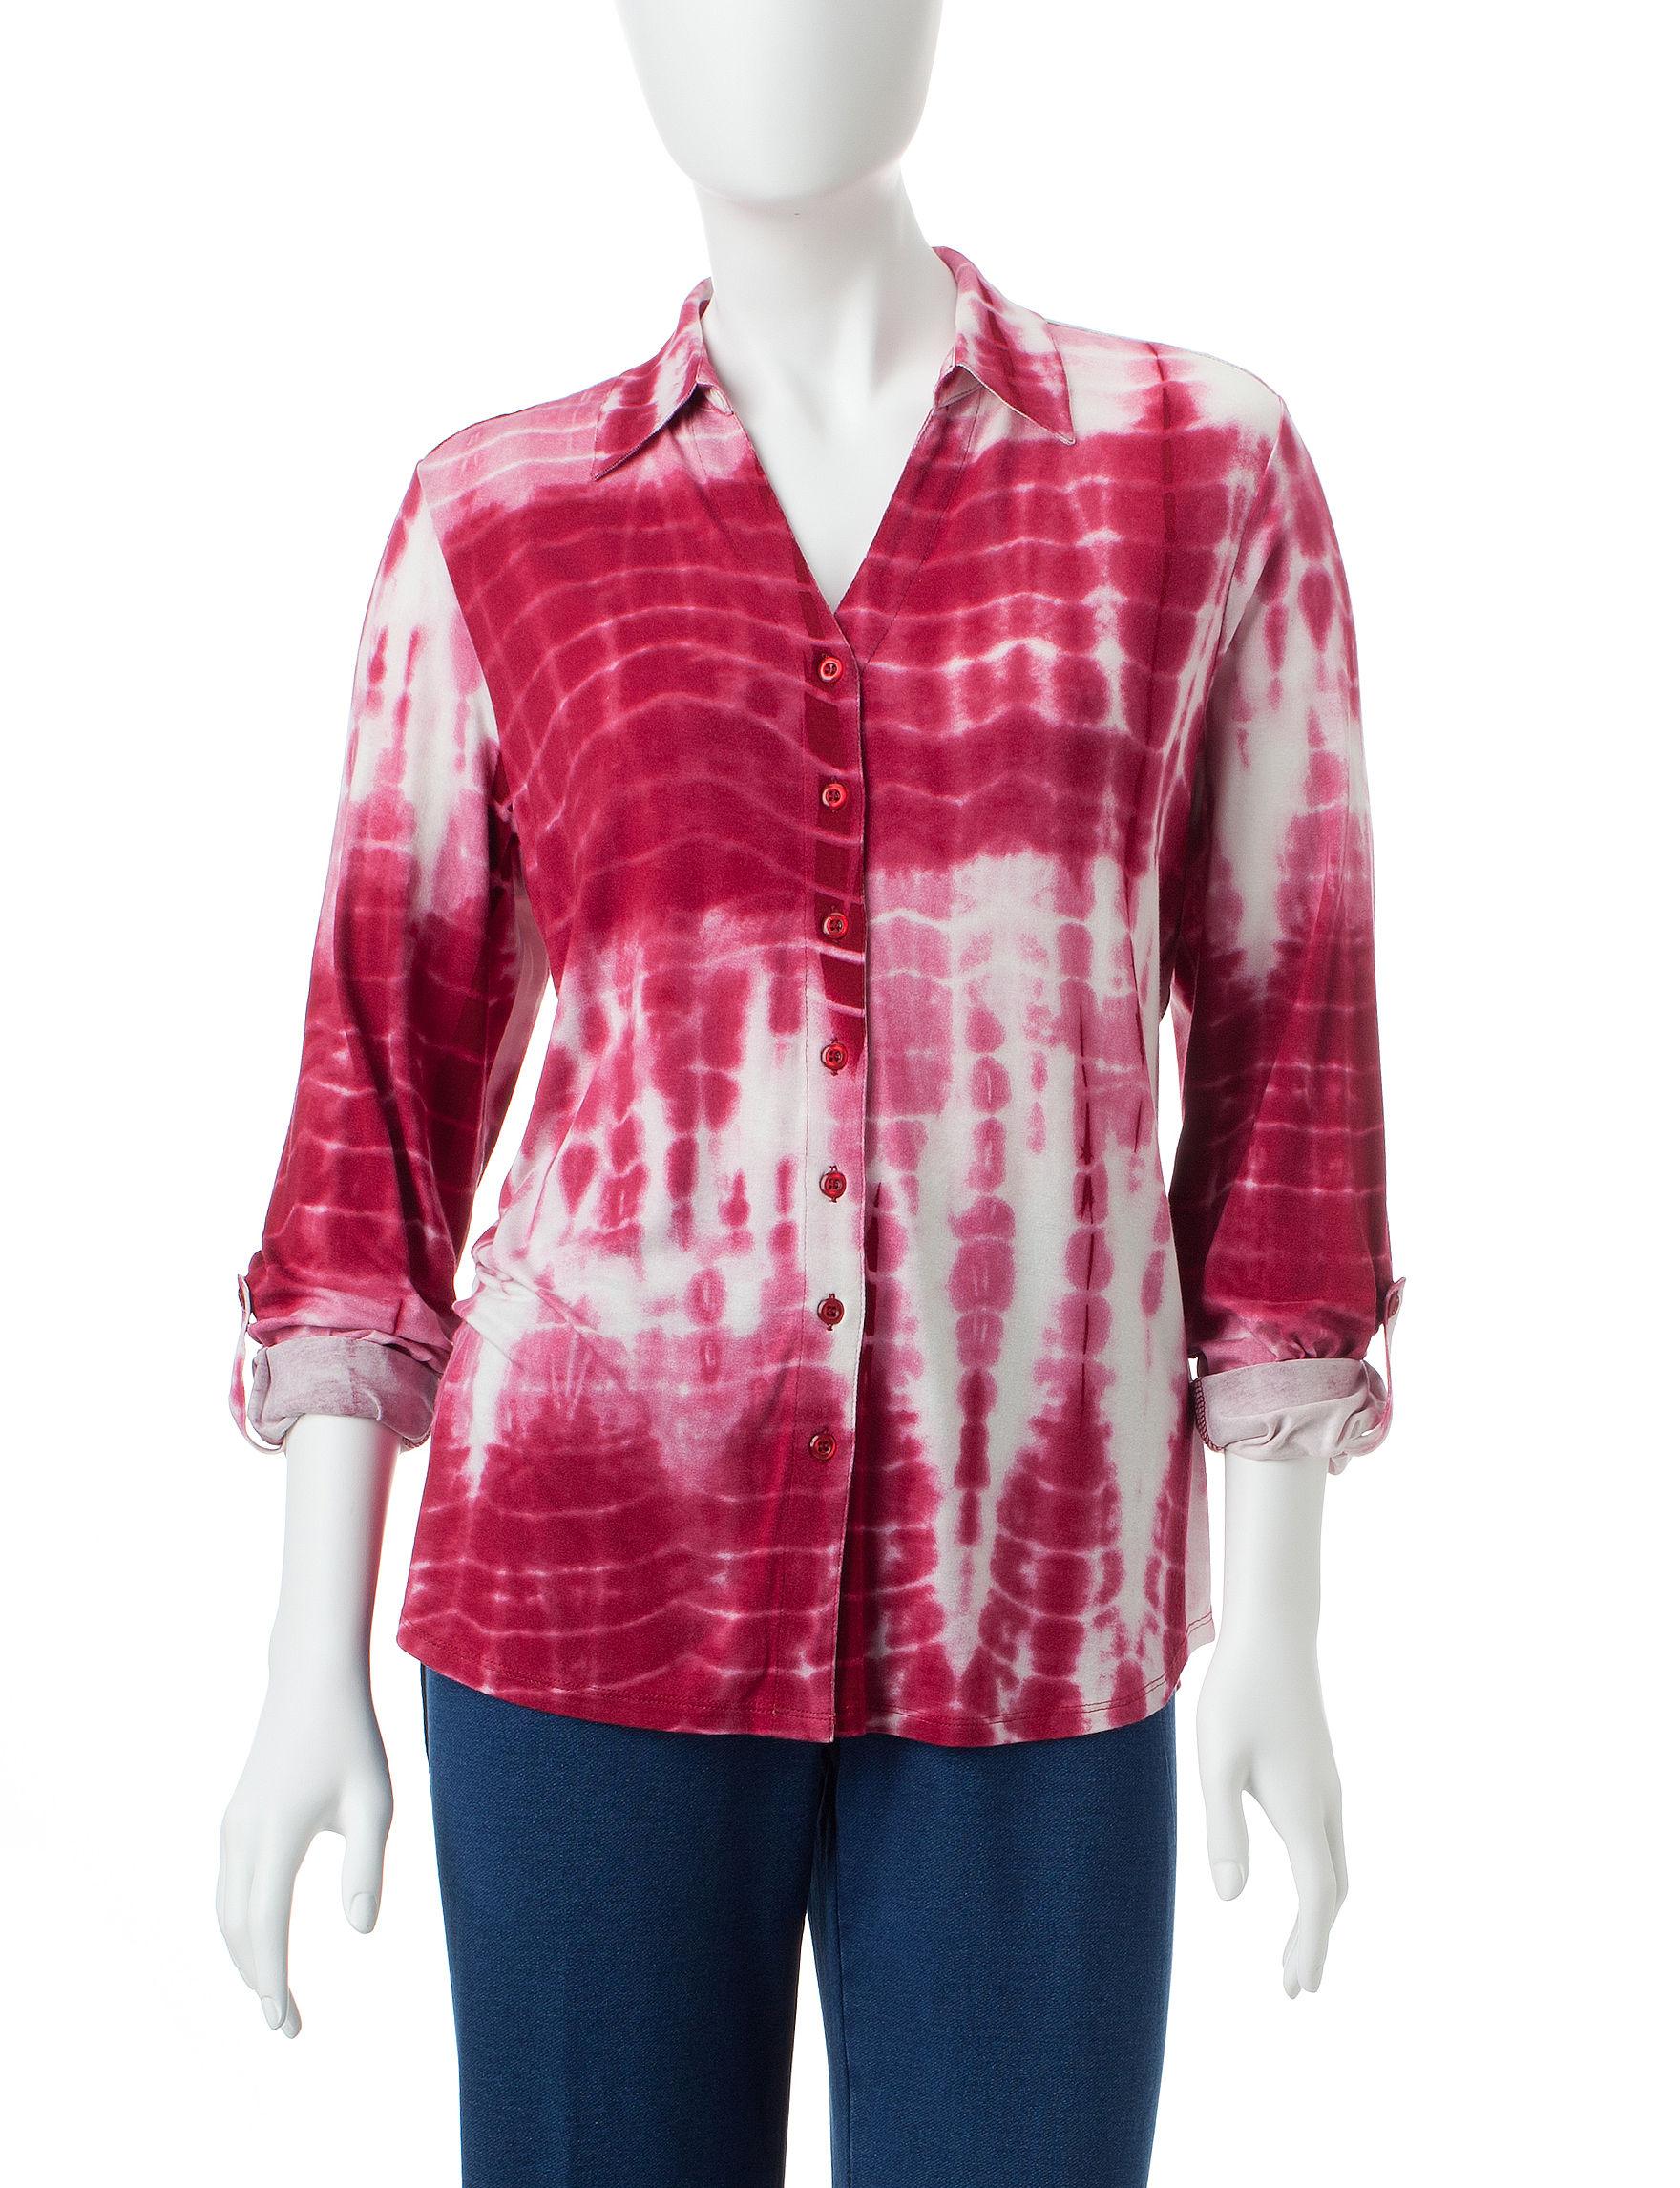 Cathy Daniels Black Shirts & Blouses